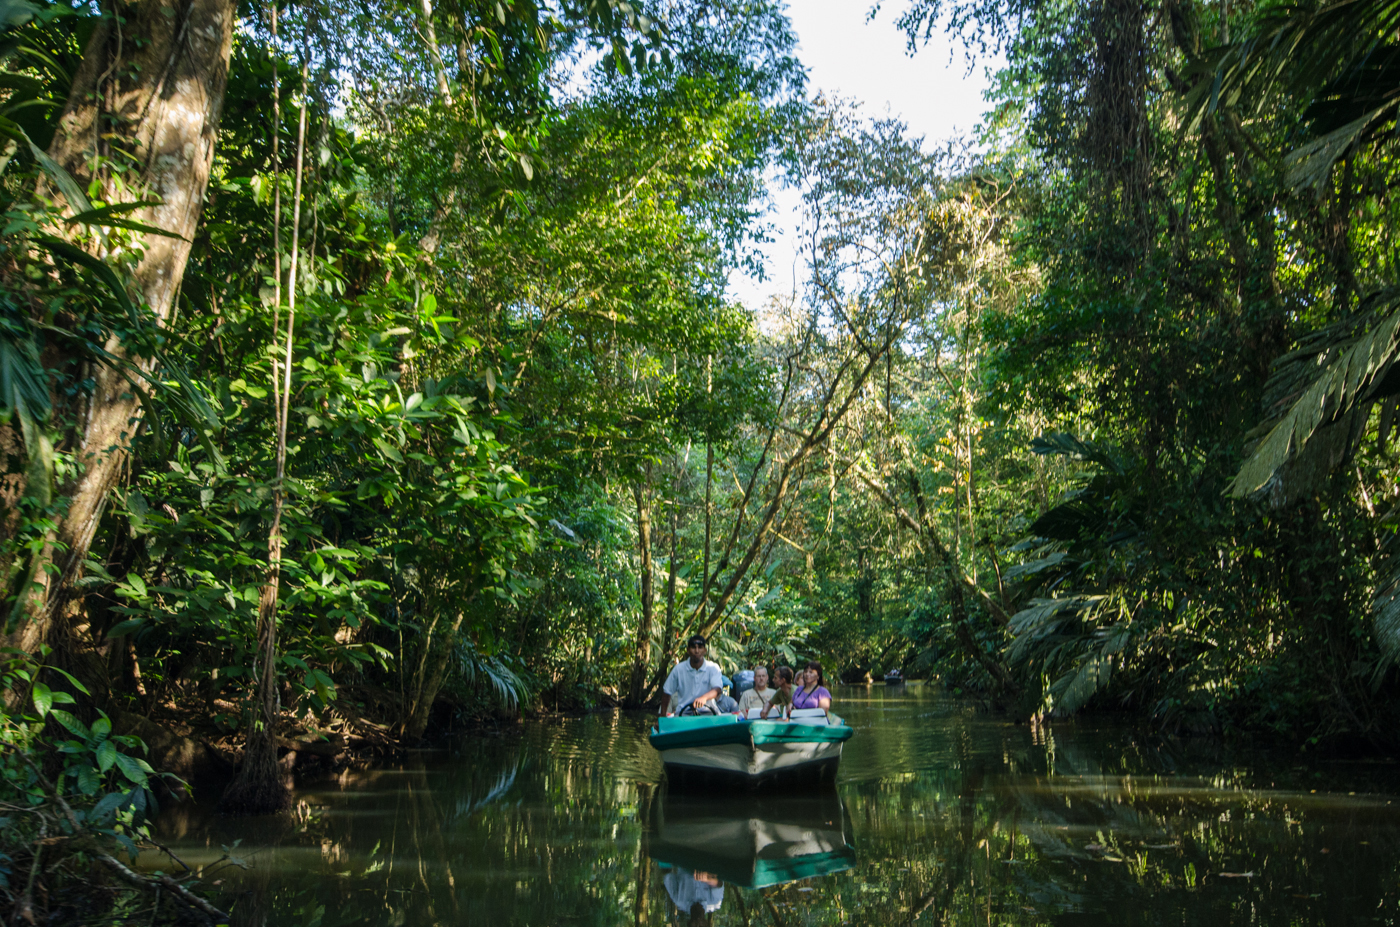 Tortuguero Jungle Exploration Tour Vacation PackageCosta Rica